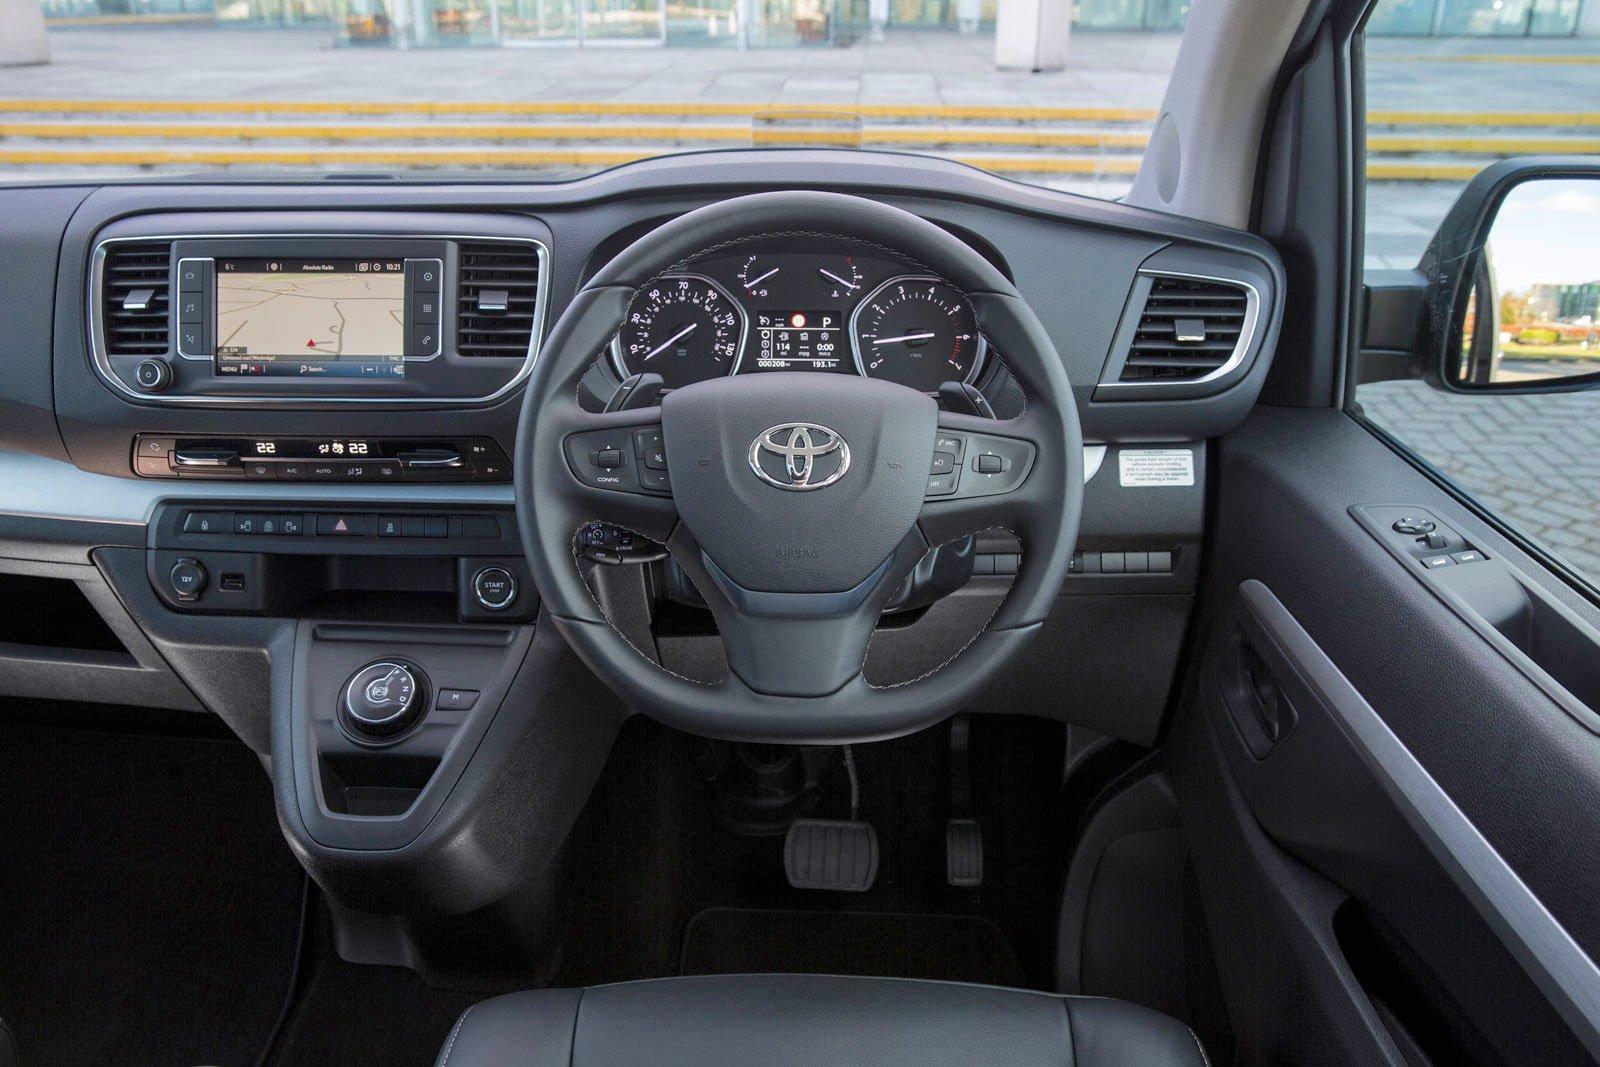 Toyota Proace Verso 2021 interior dashboard